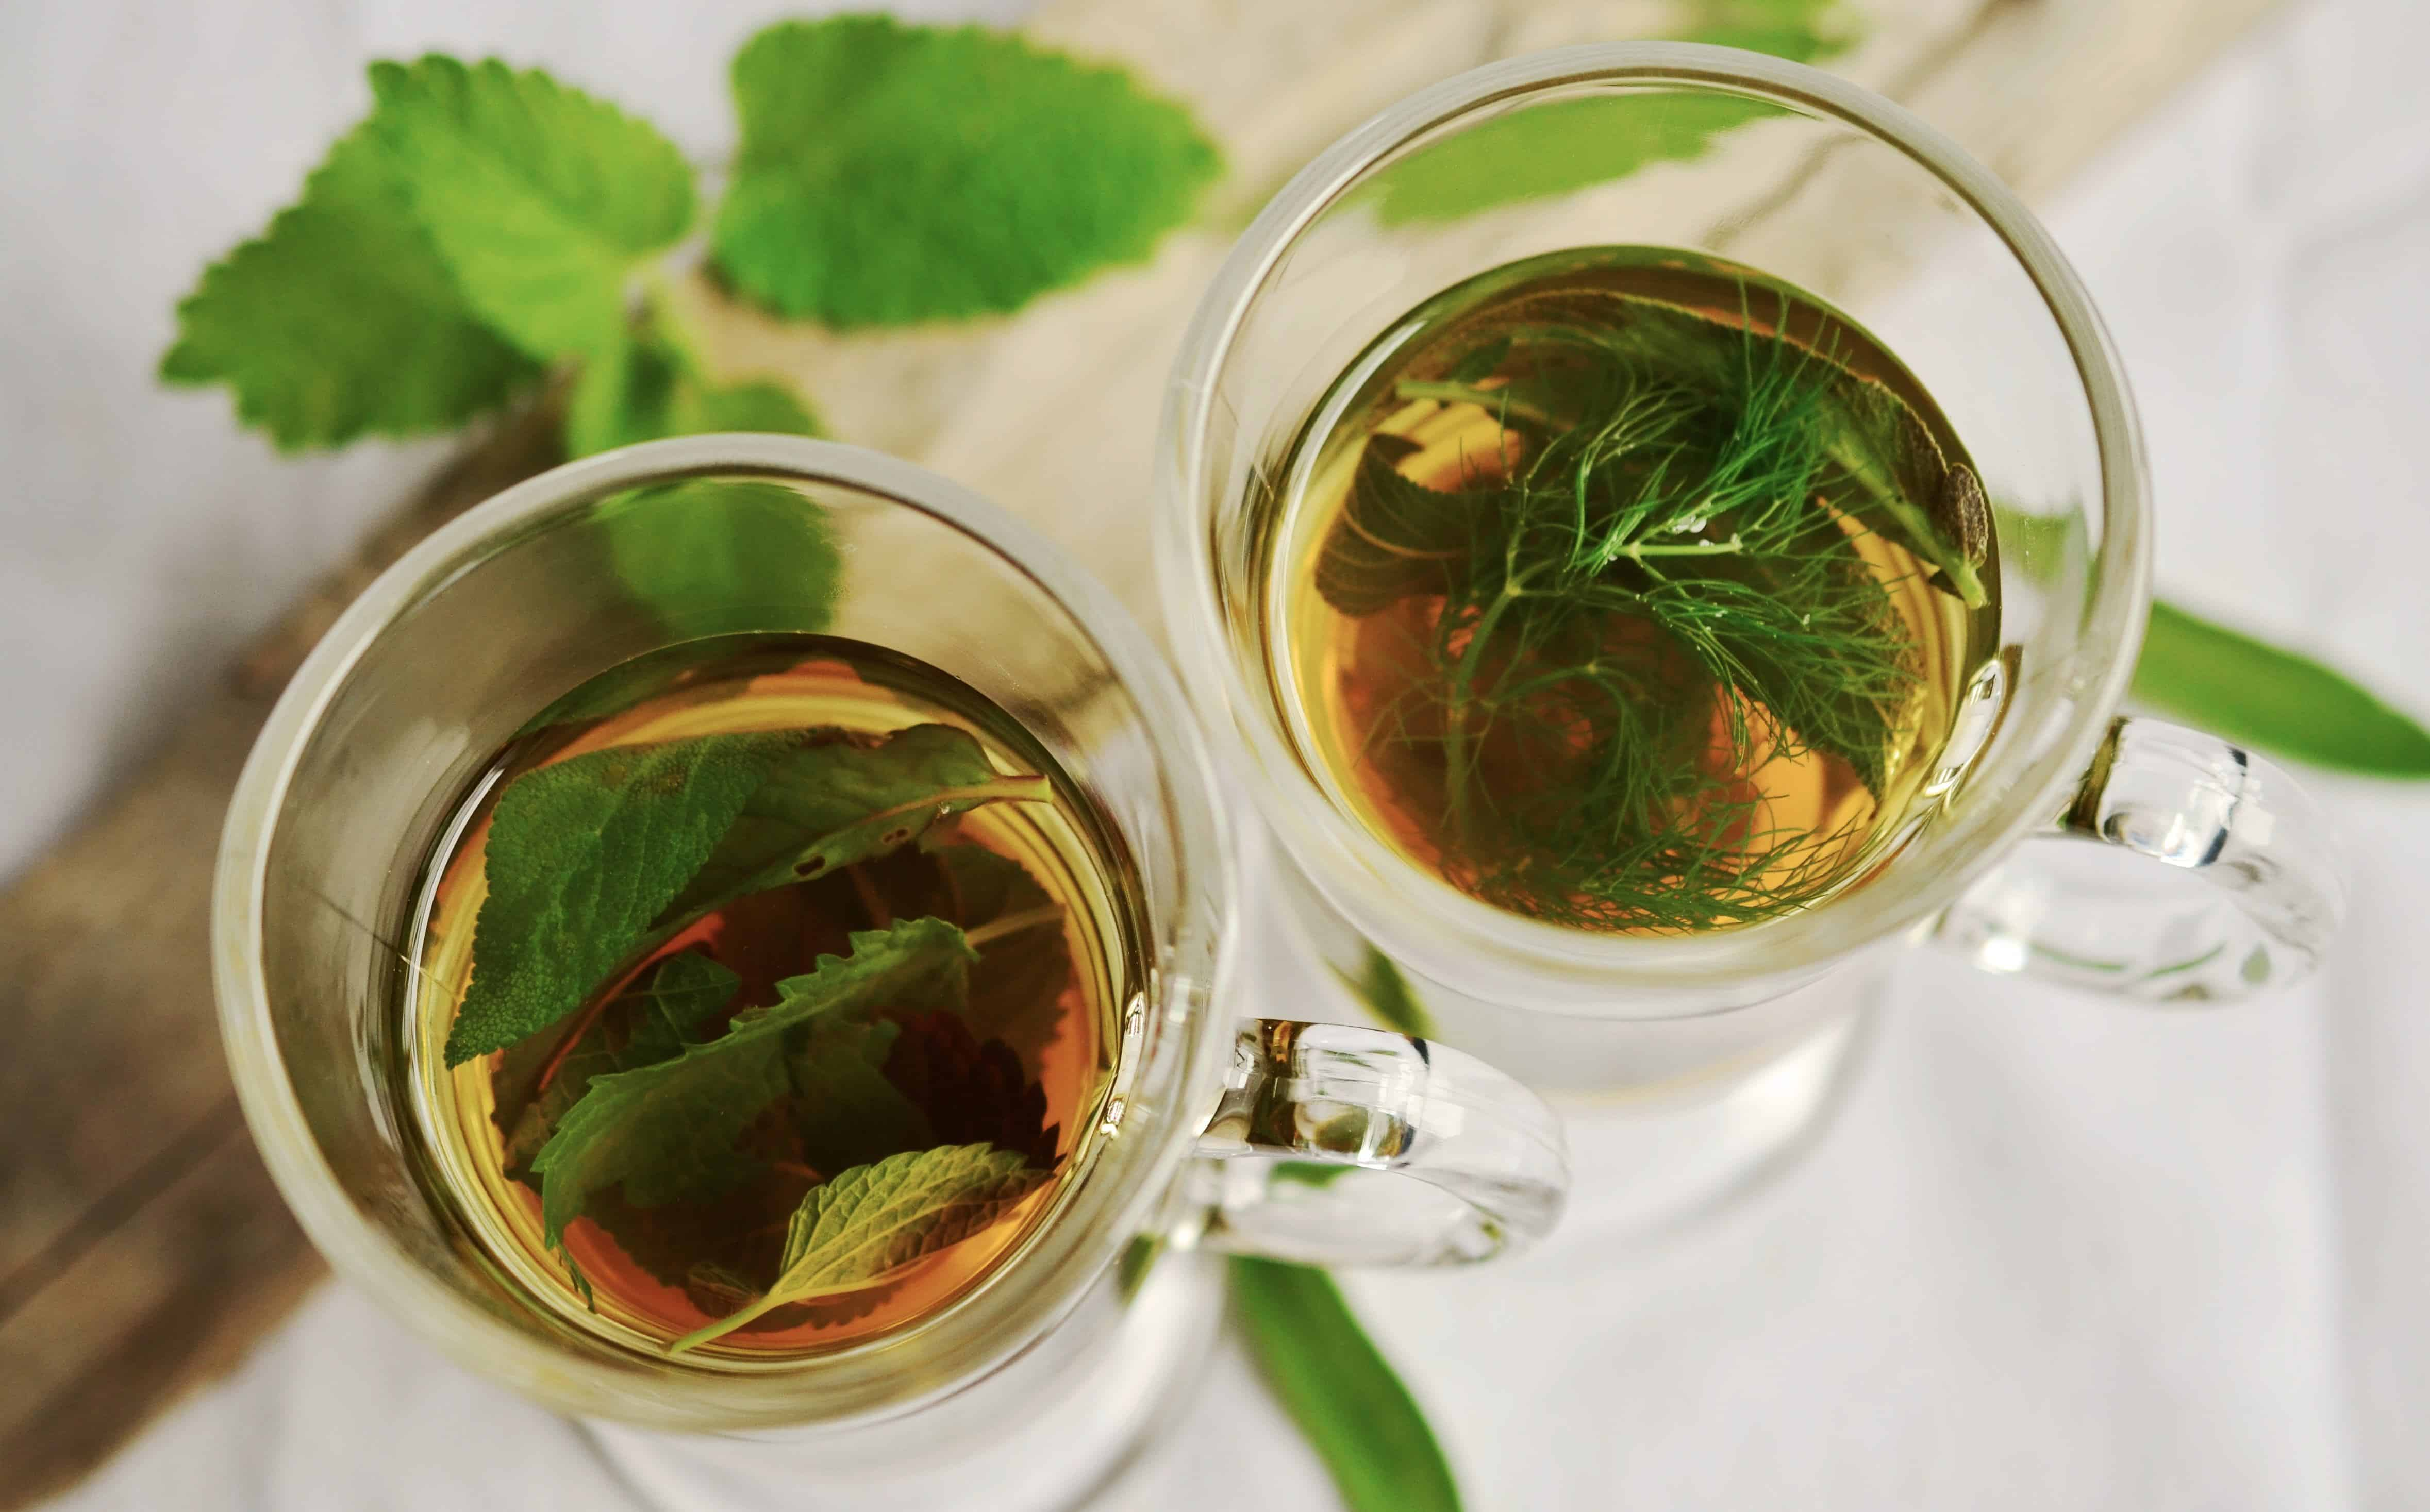 teas good for uti